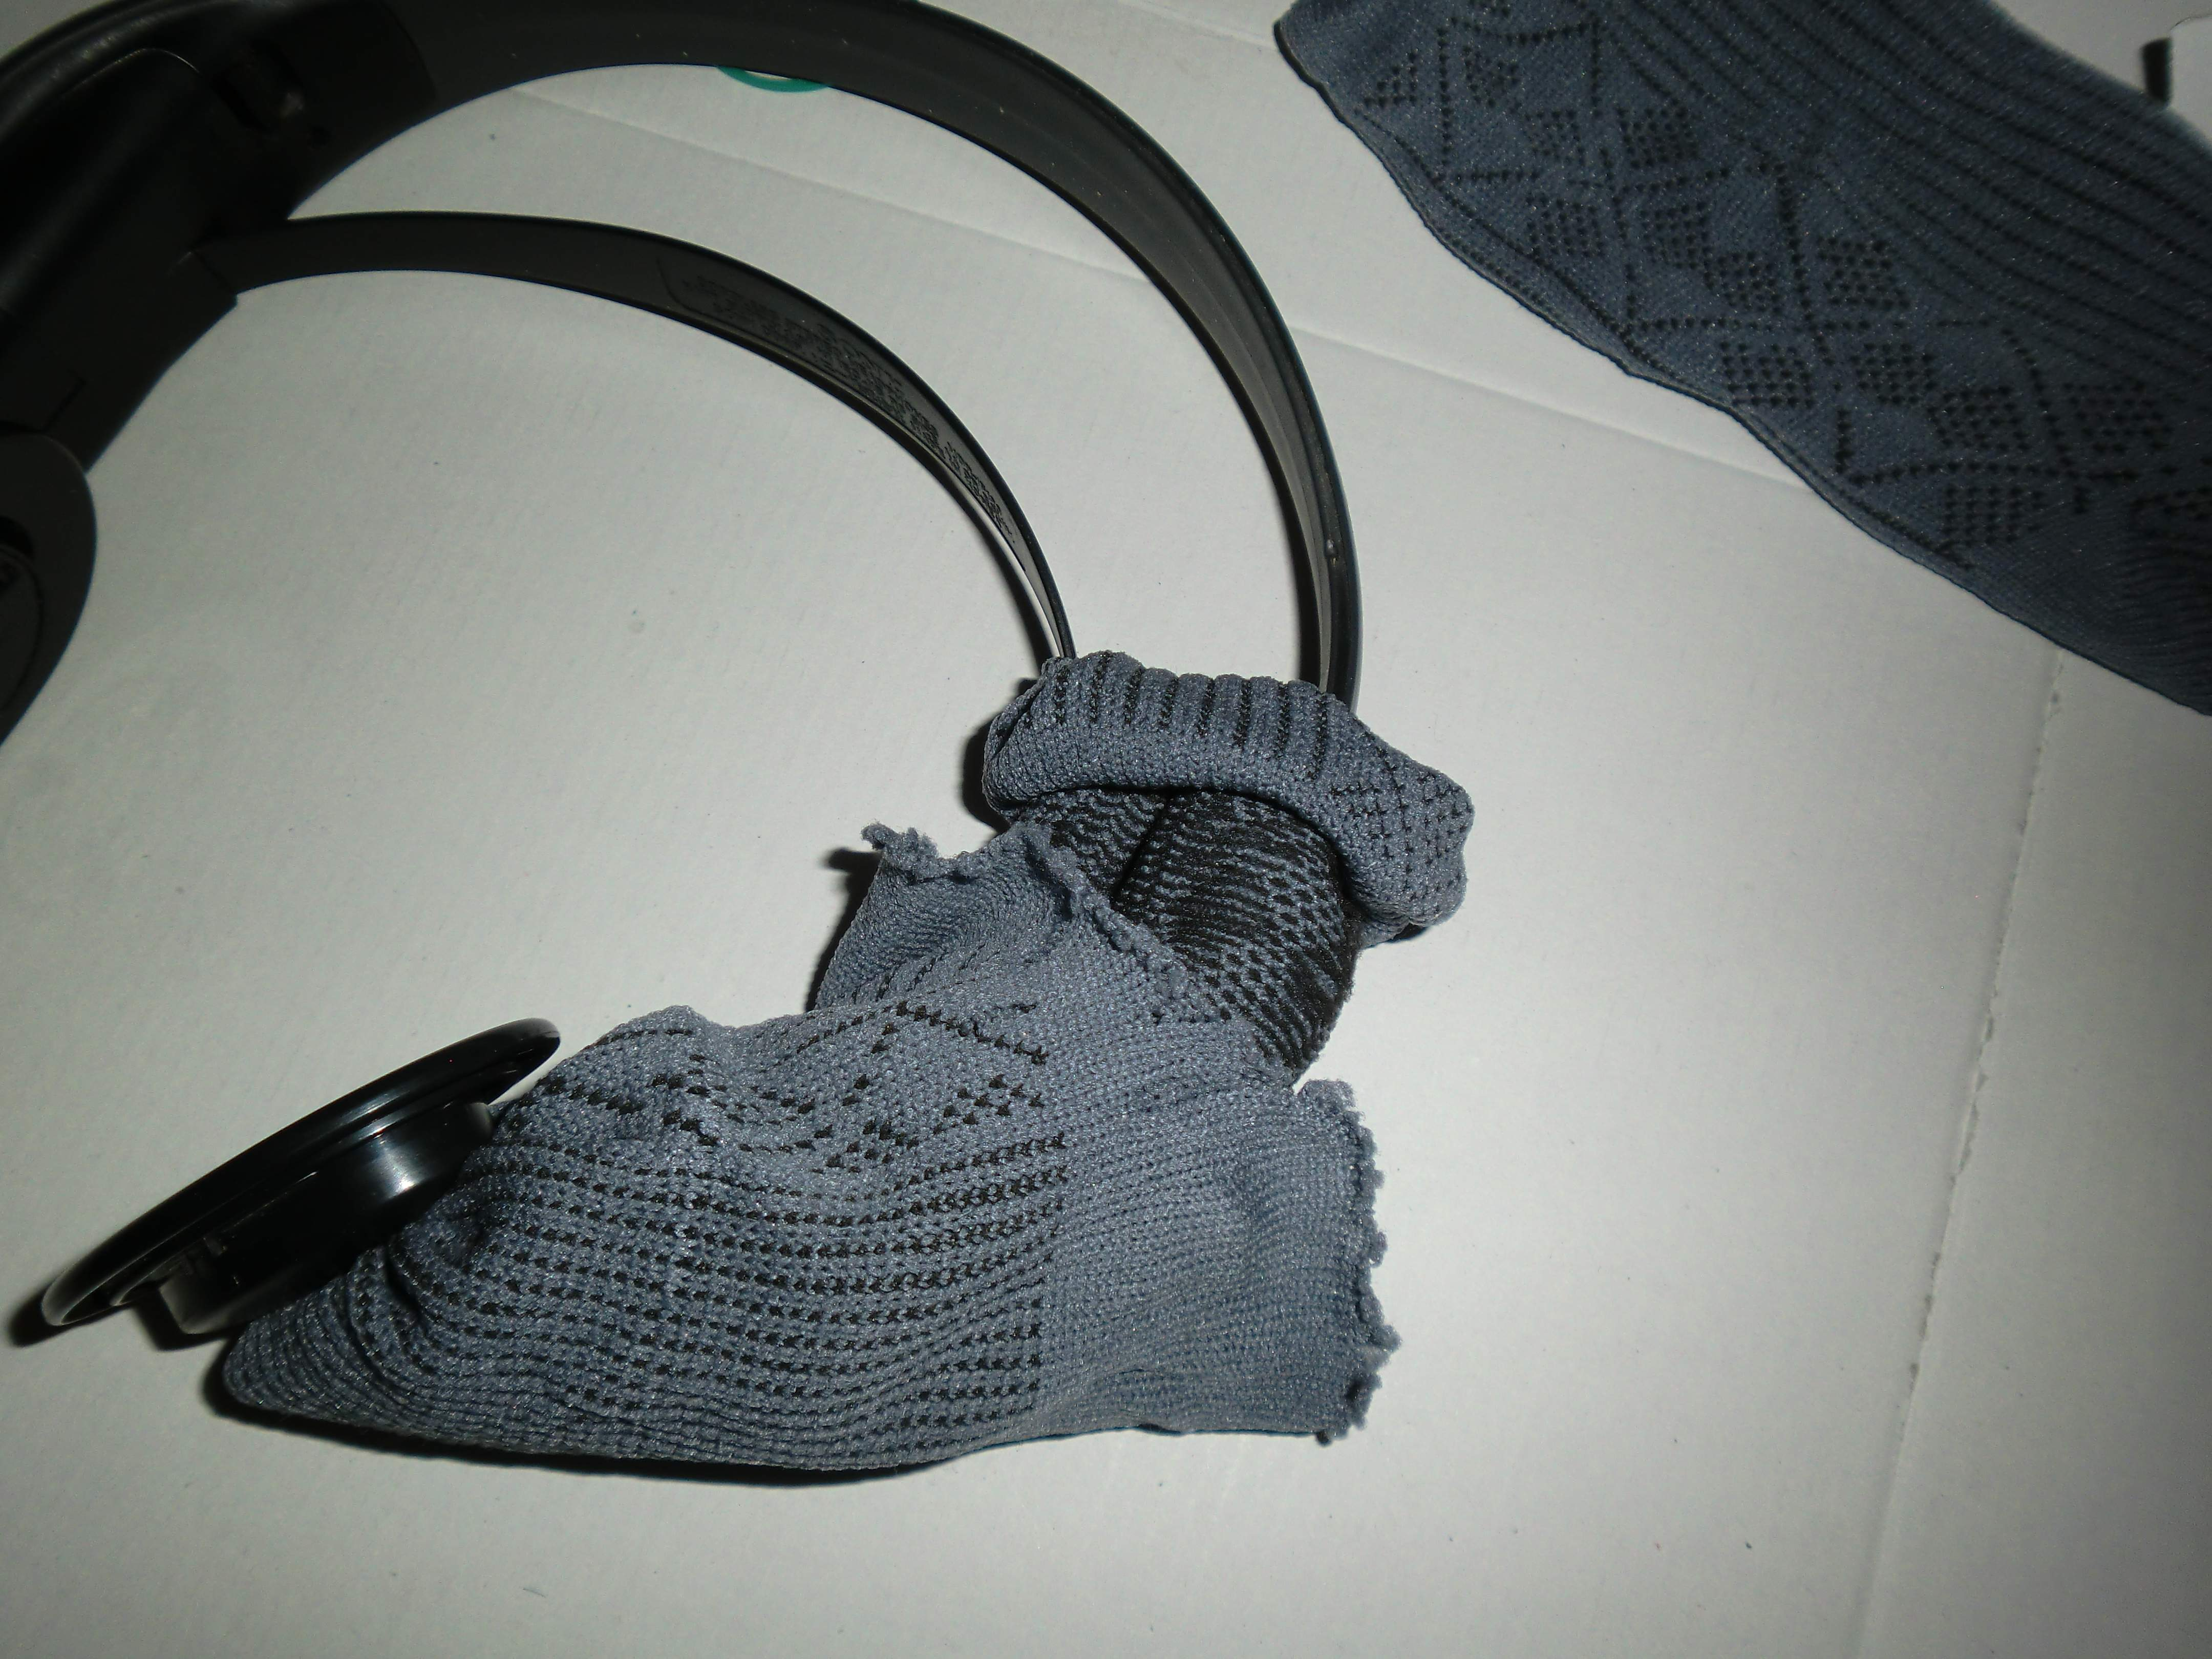 Picture of Rolling Up Sock / Enrollando El Calcetin